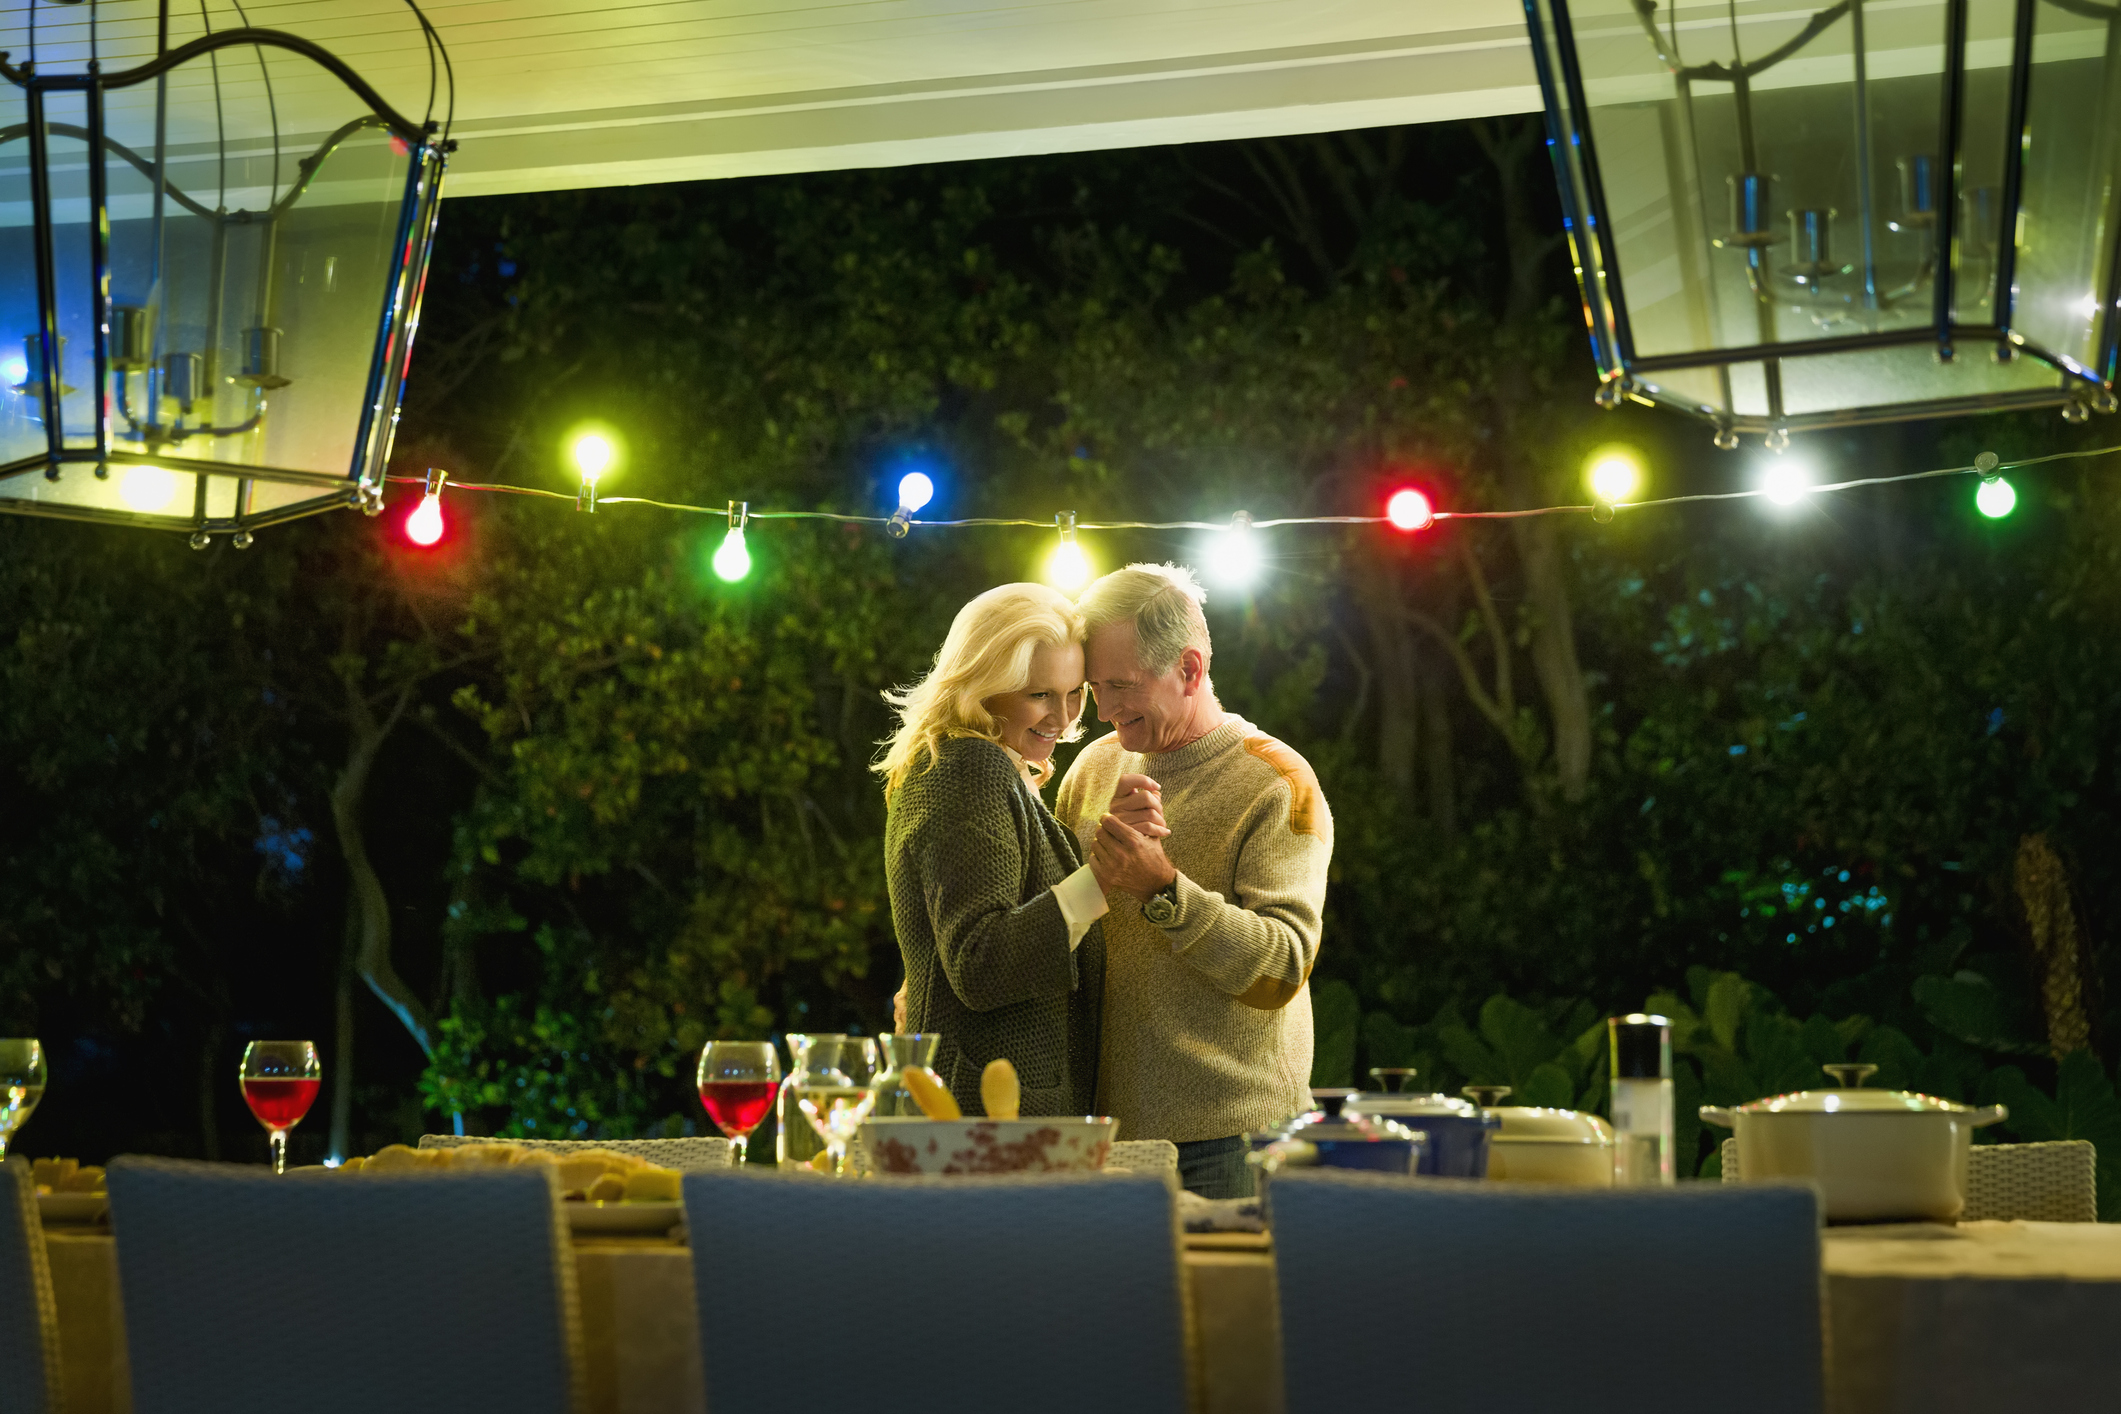 Romantic senior couple dancing at table on illuminated porch